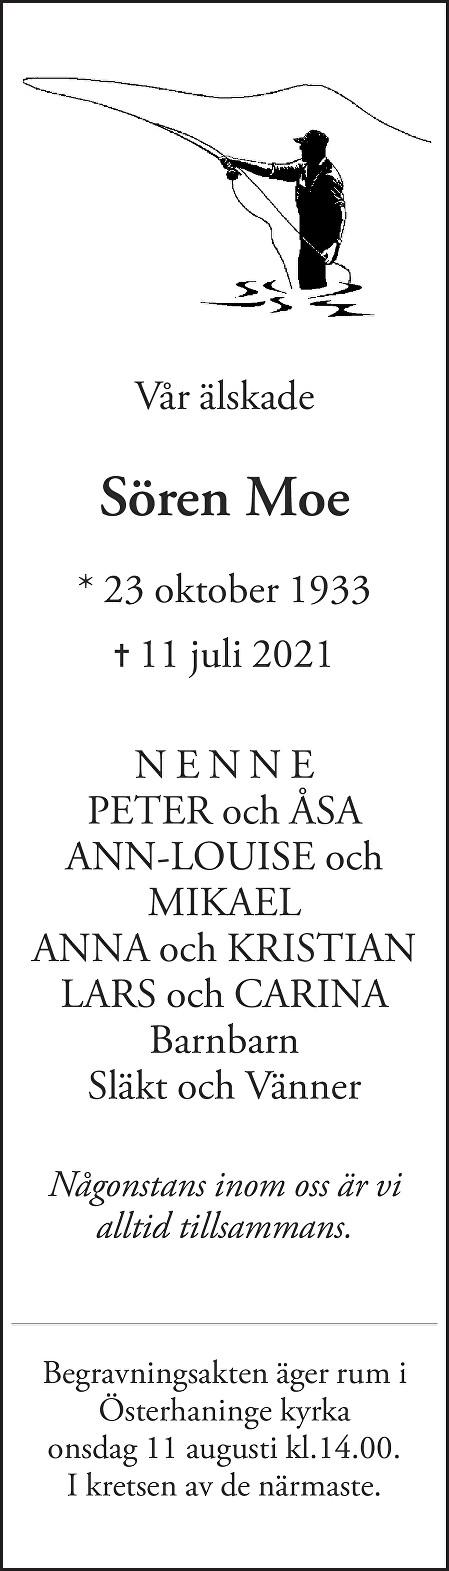 Sören Moe Death notice